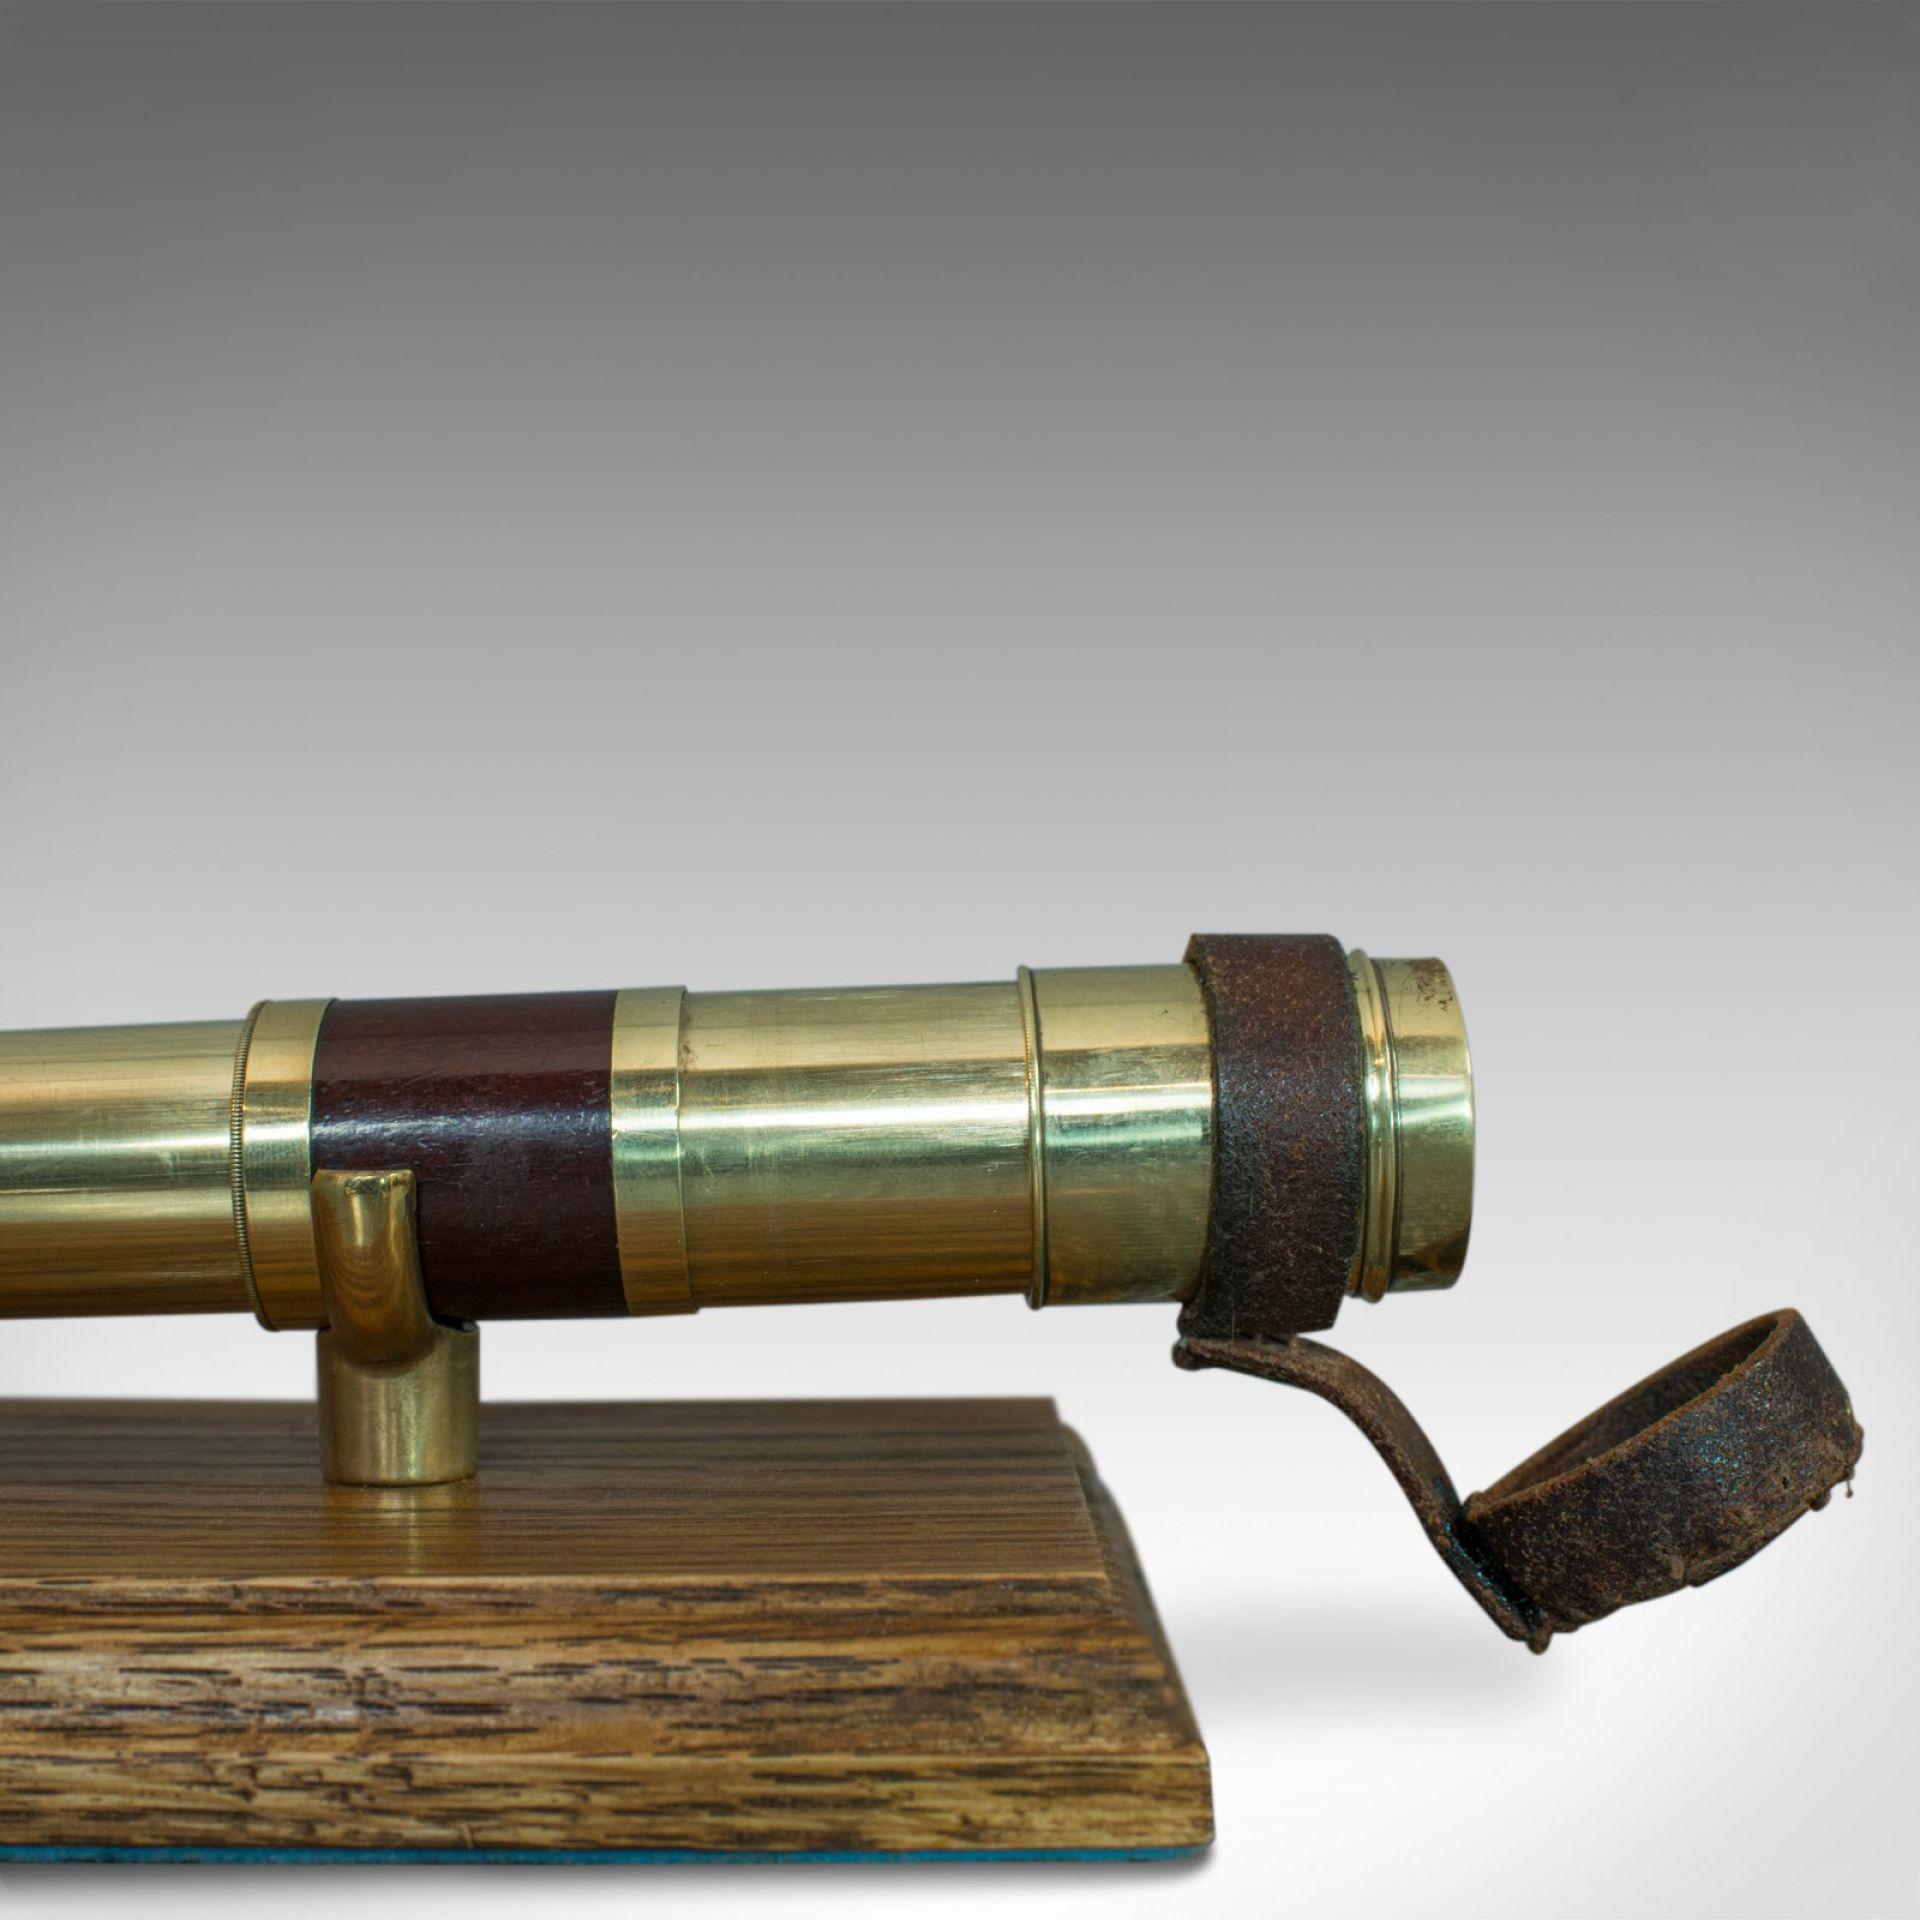 Antique Pocket Telescope, 6 Draw, English, Compact, Negretti and Zambra, C.1860